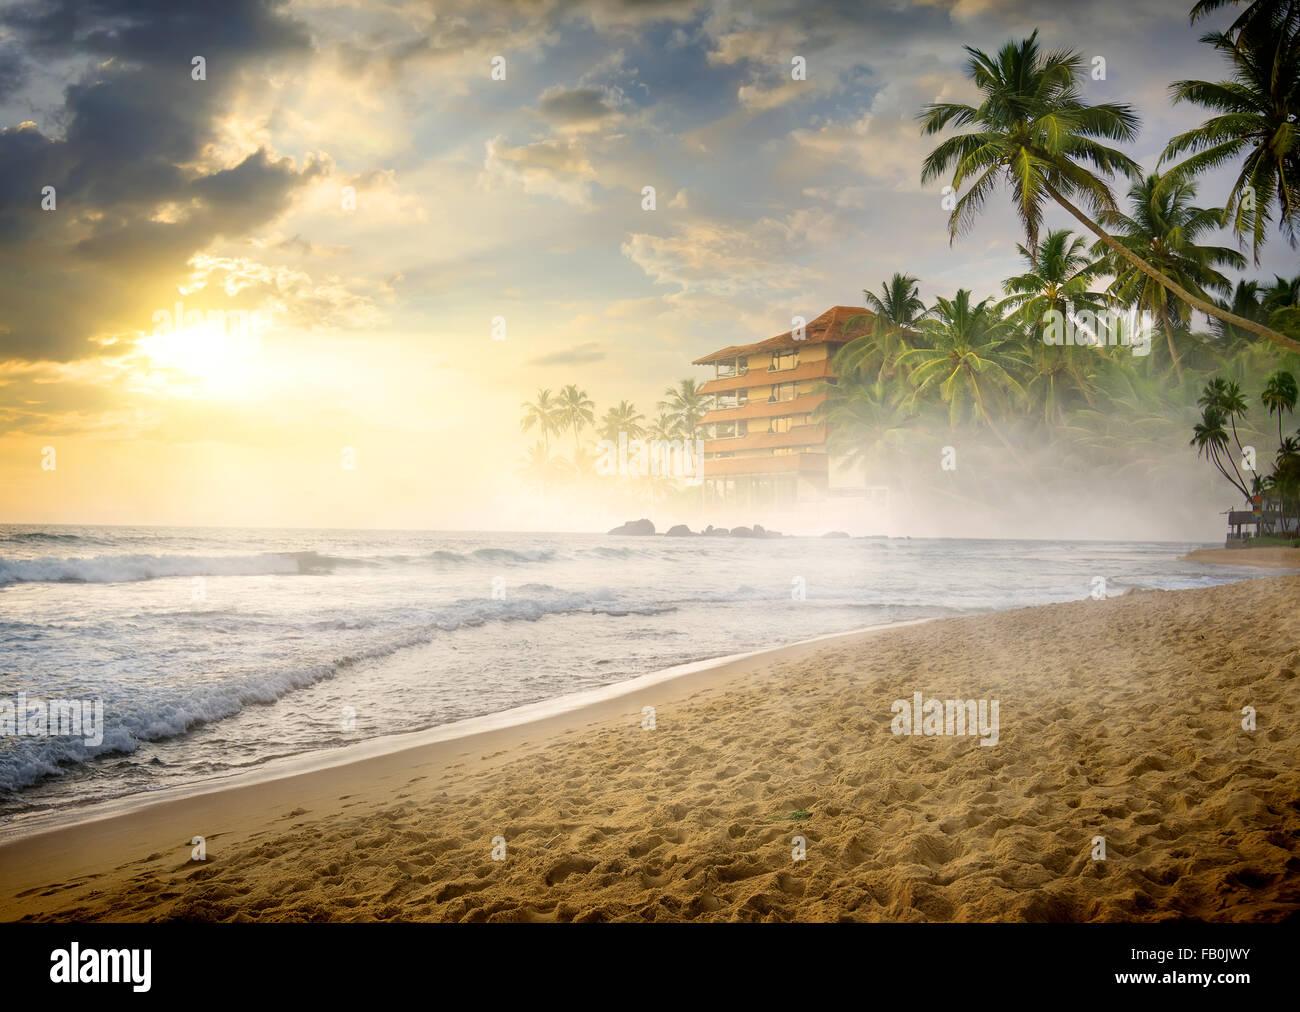 Morgennebel über sandigen Strand des Ozeans Stockbild